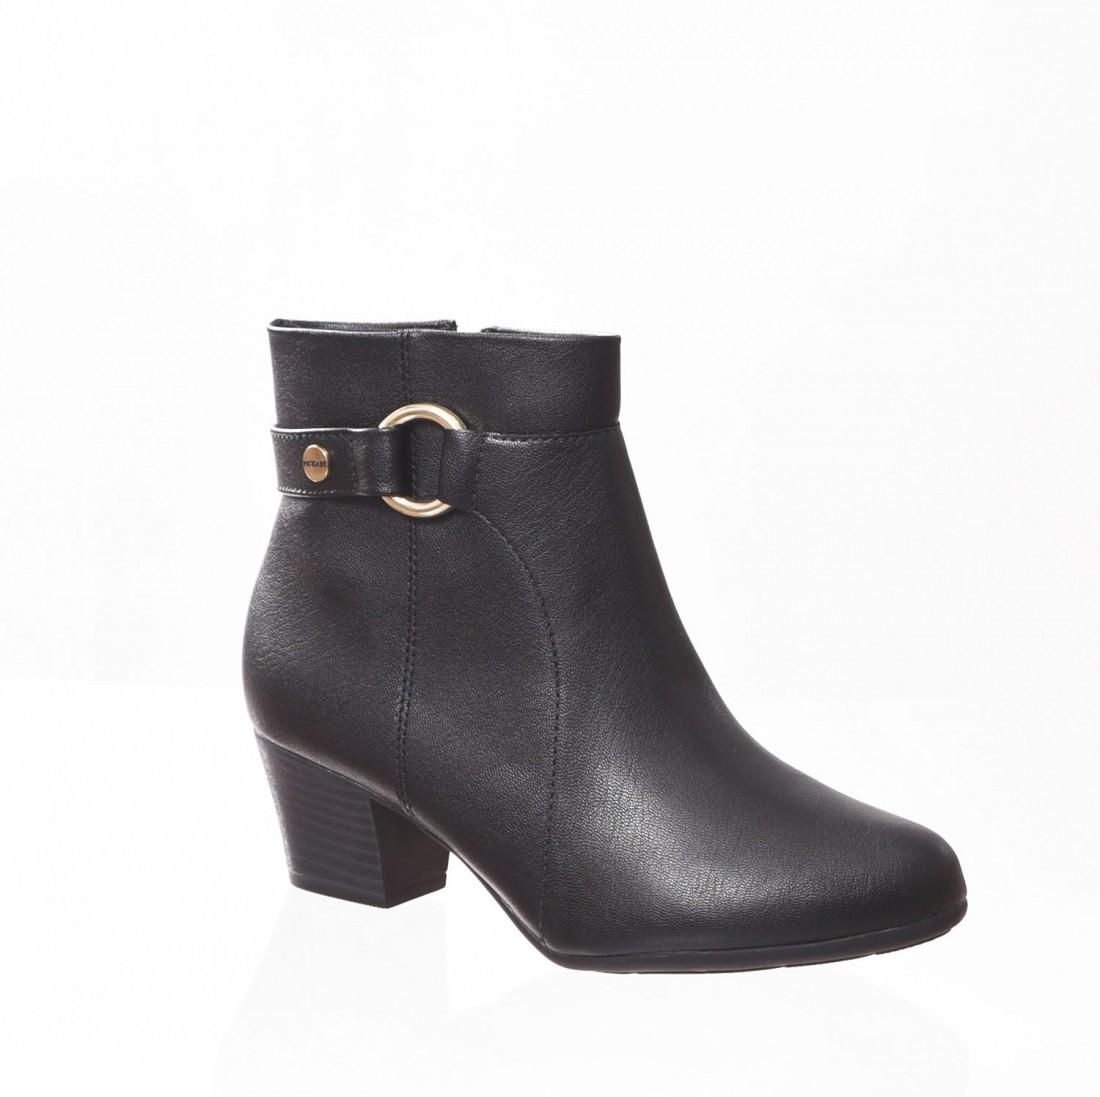 8f711e8e96 Bota Ankle Boot Modare Ultra Conforto Detalhe Fivela Preta - LM ...